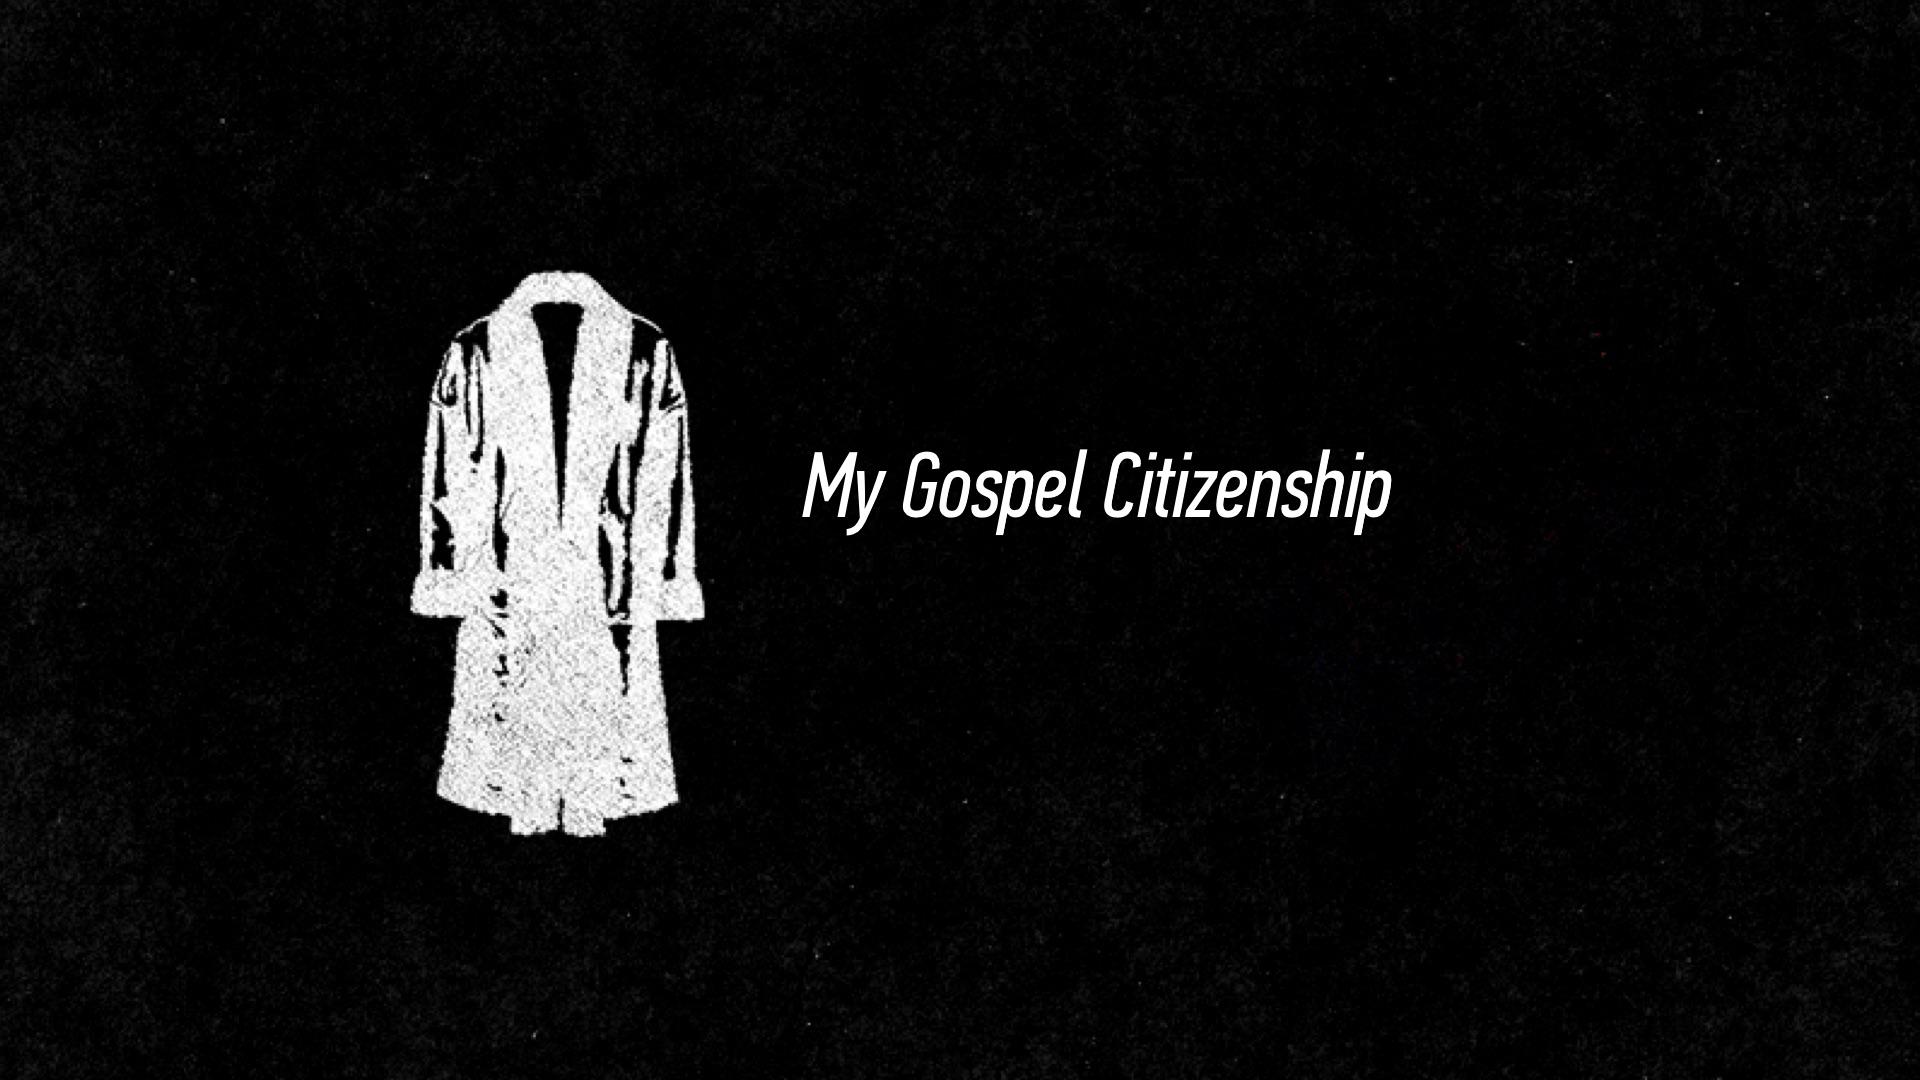 20160529 My Gospel Citizenship.jpg